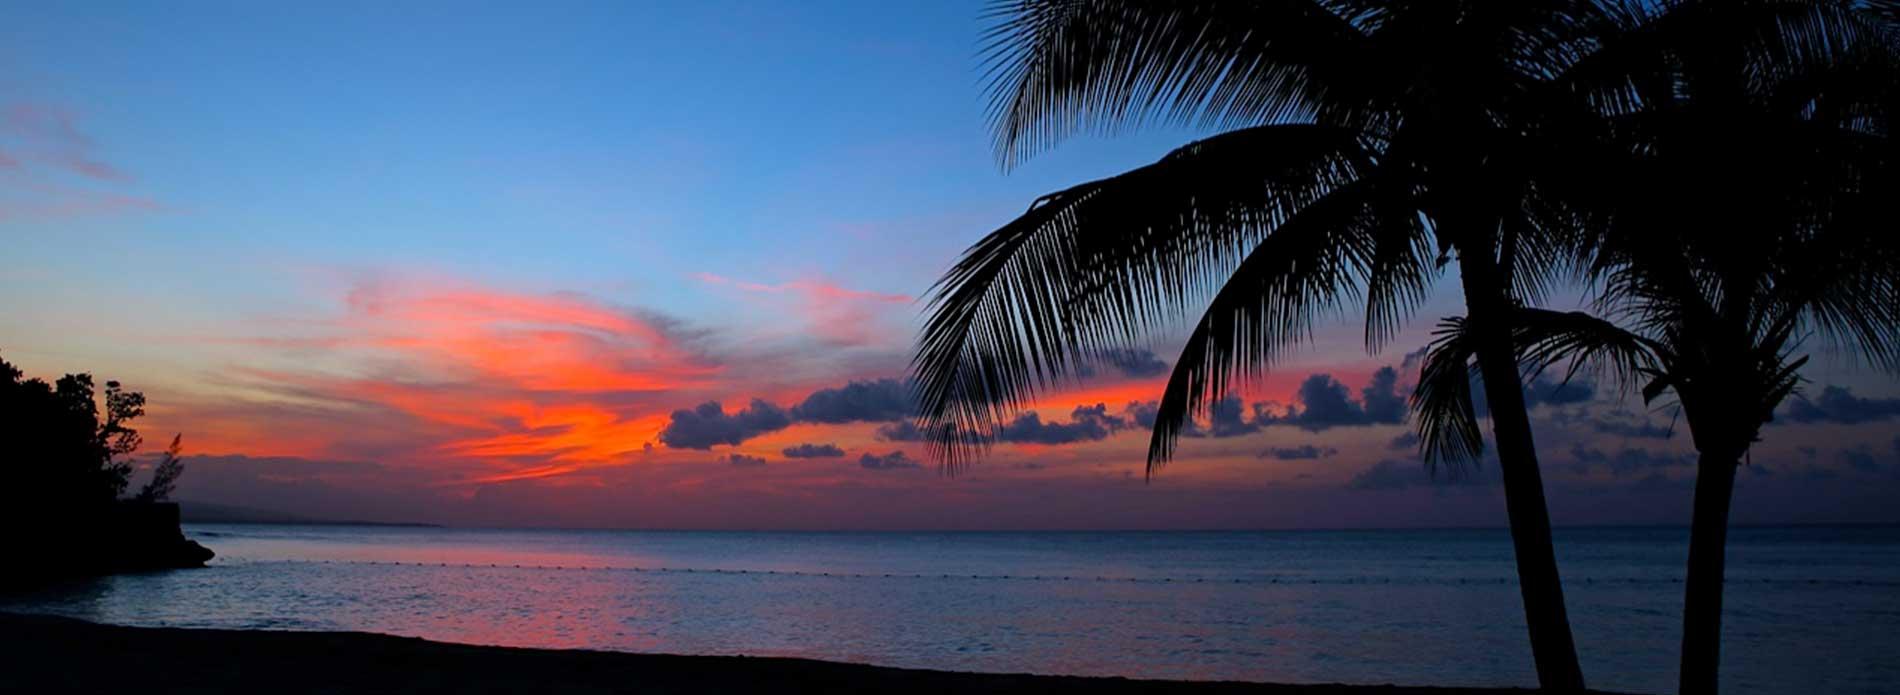 sunset-jamaica